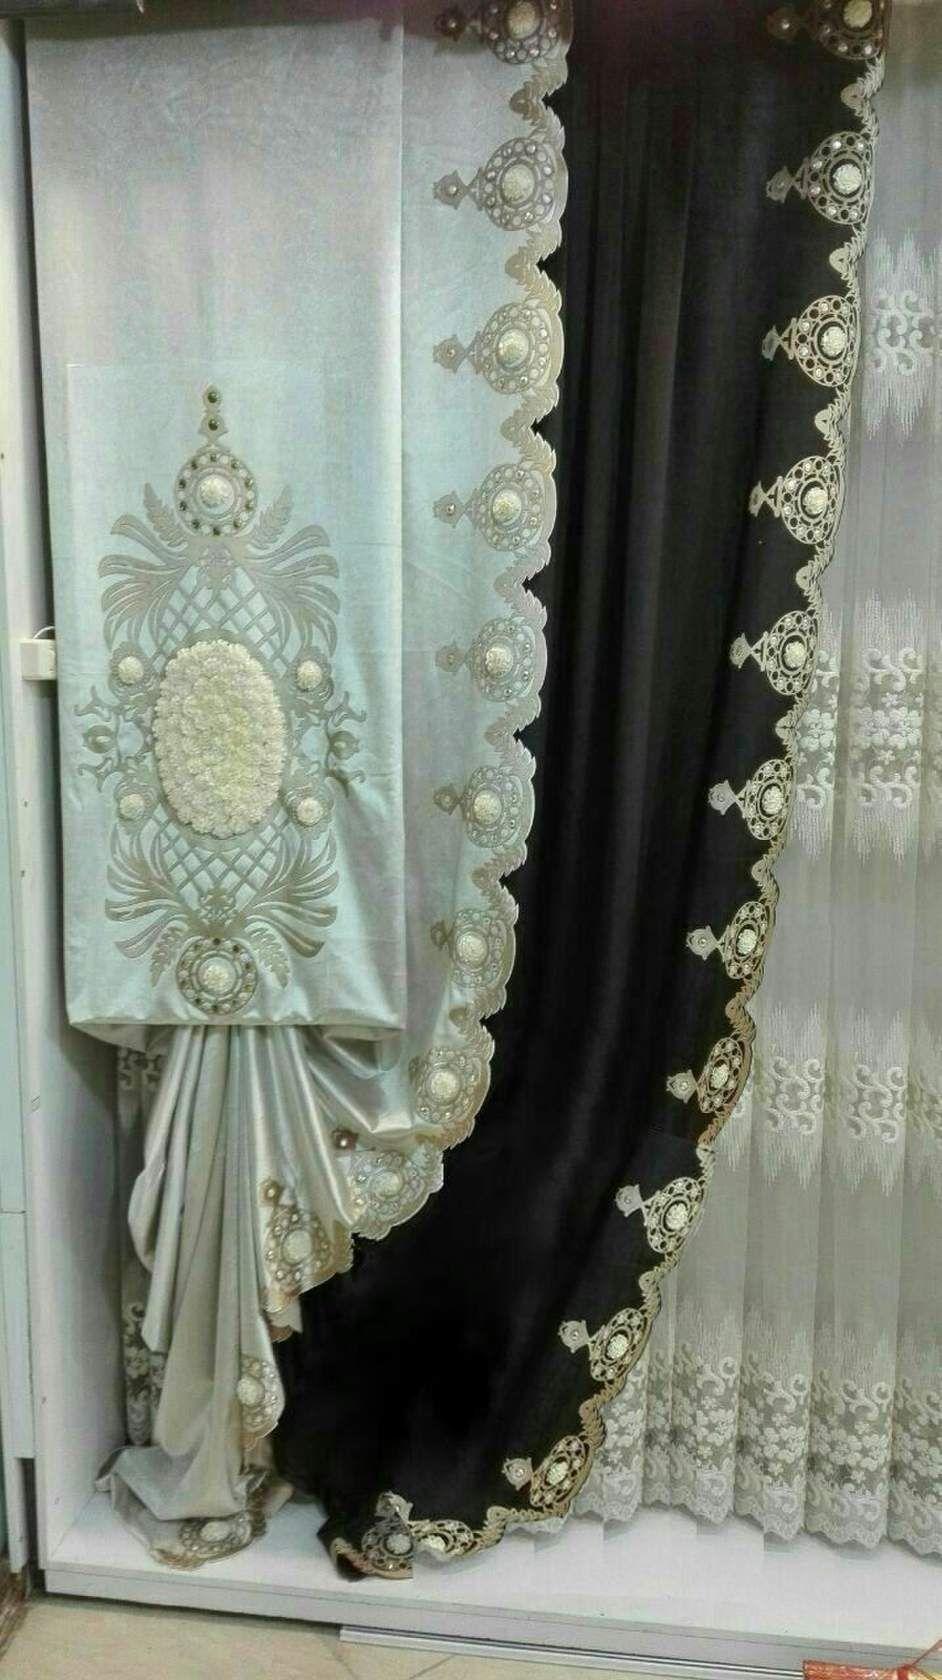 Luxury window coverings  Фотография  curtains  pinterest  window curtain ideas and interiors